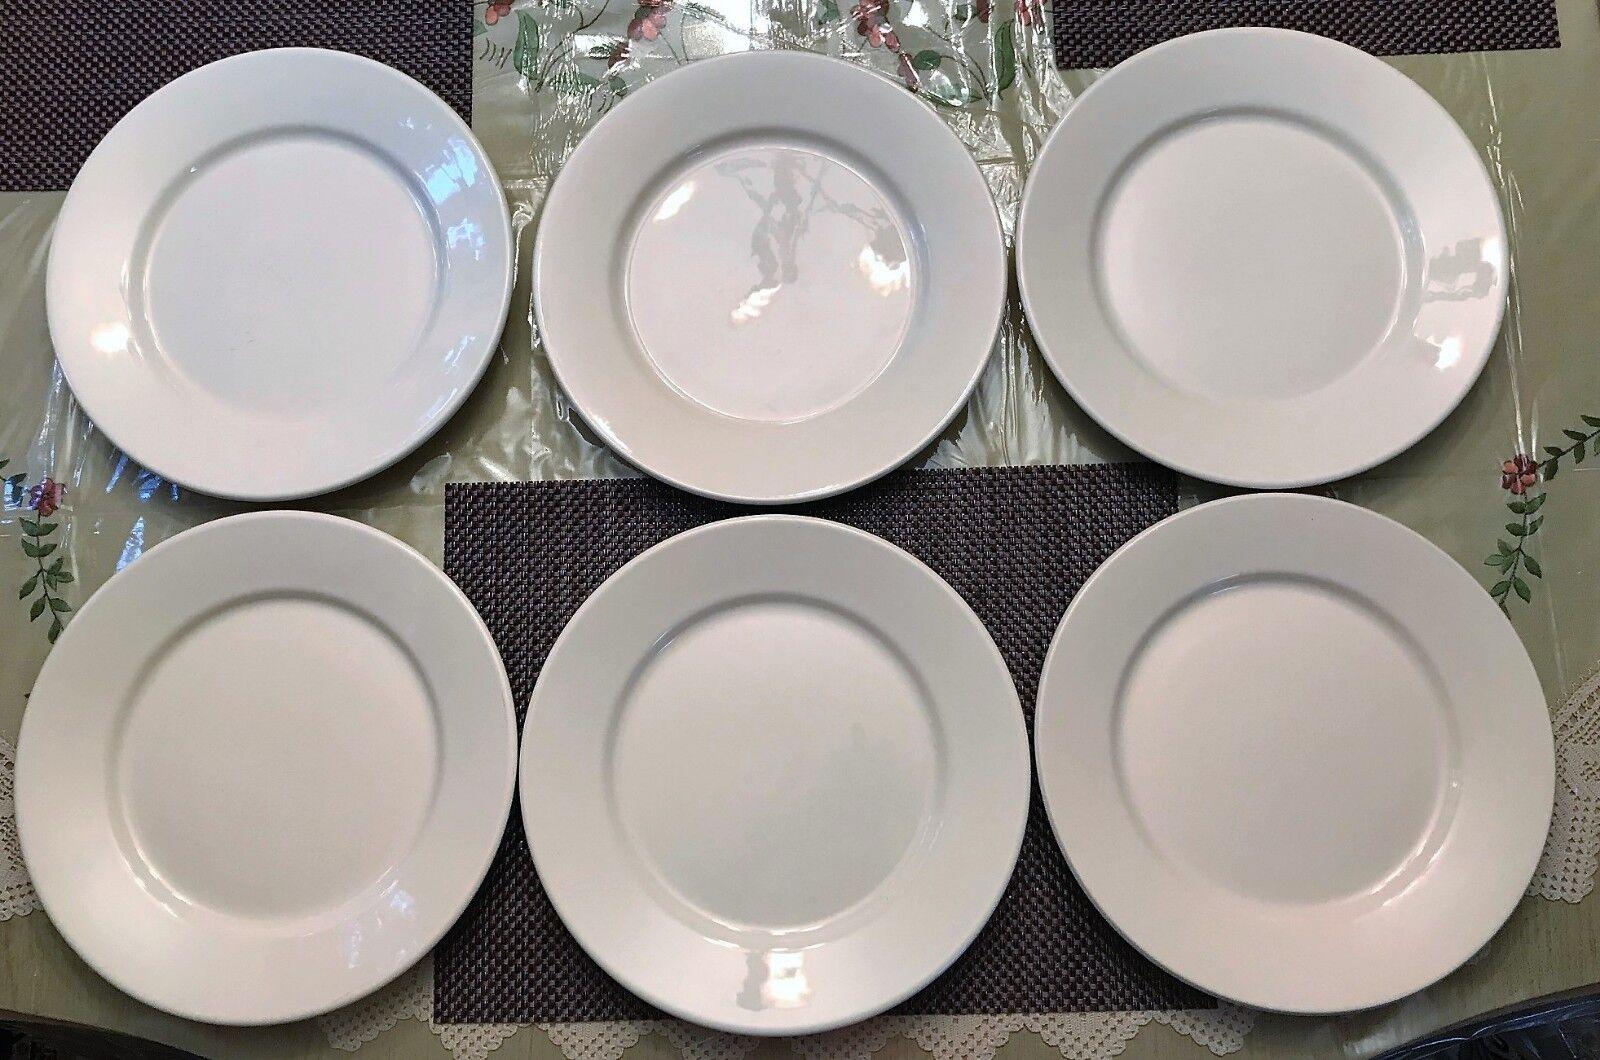 Barbara Eigen for PotteryBarn, Dana Dinner Plates, Made in Portugal Set 6